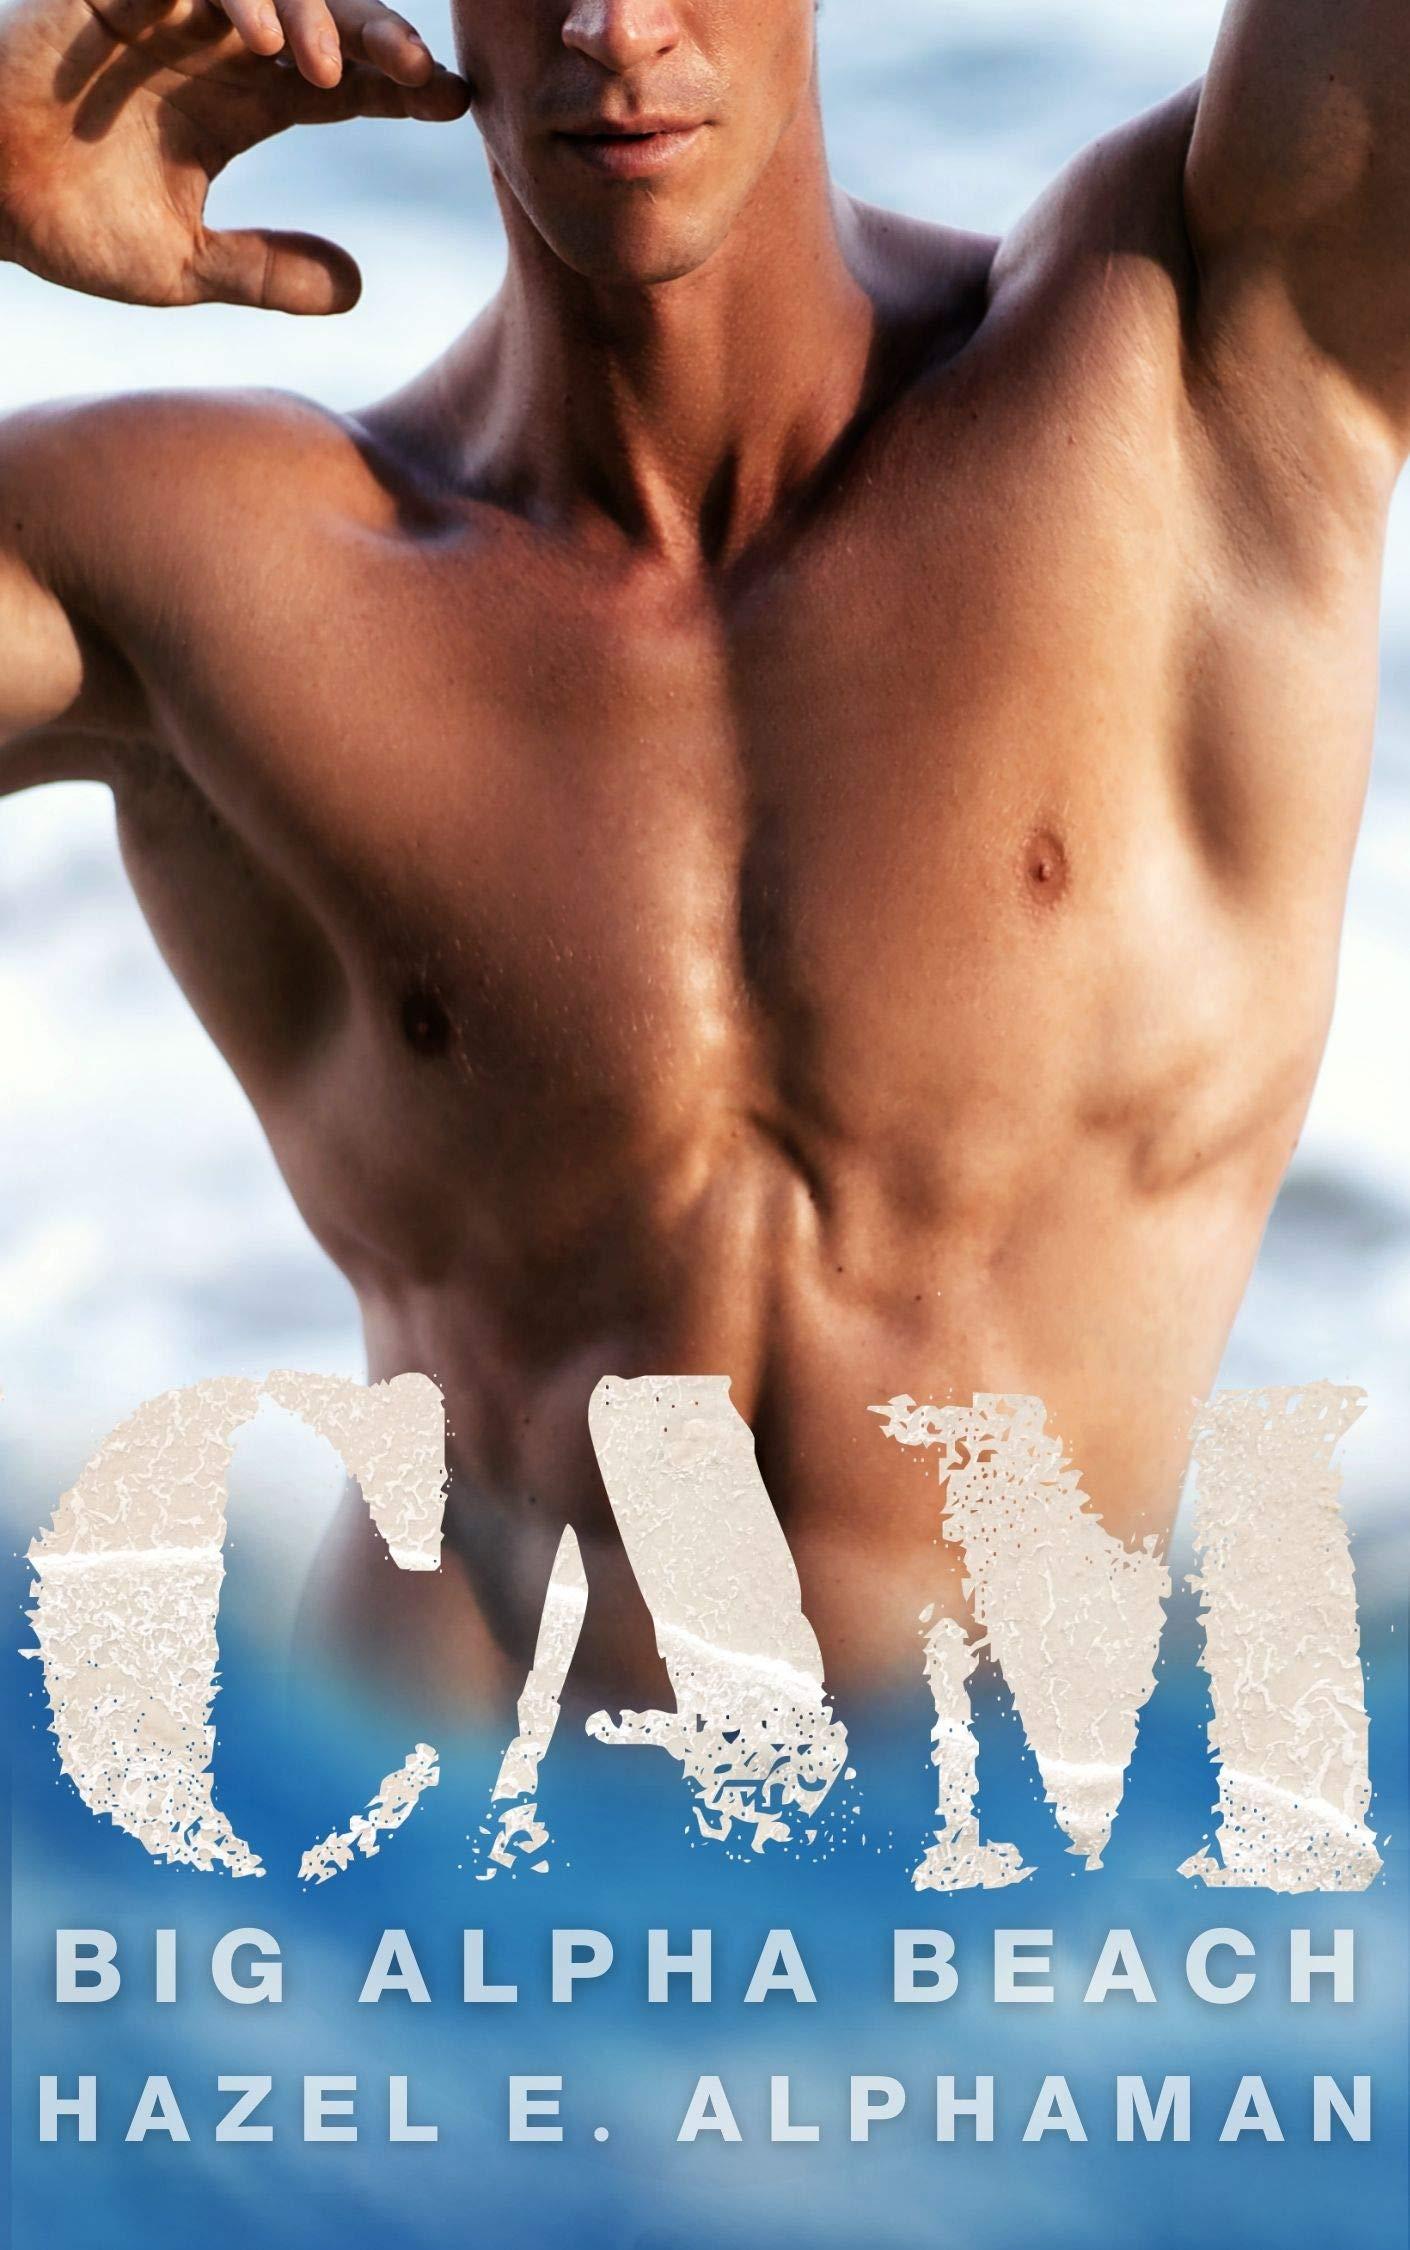 CAM: An OTT Big Alpha BBW OMYW Romance (Big Alpha Beach Book 2) Hazel E. Alphaman